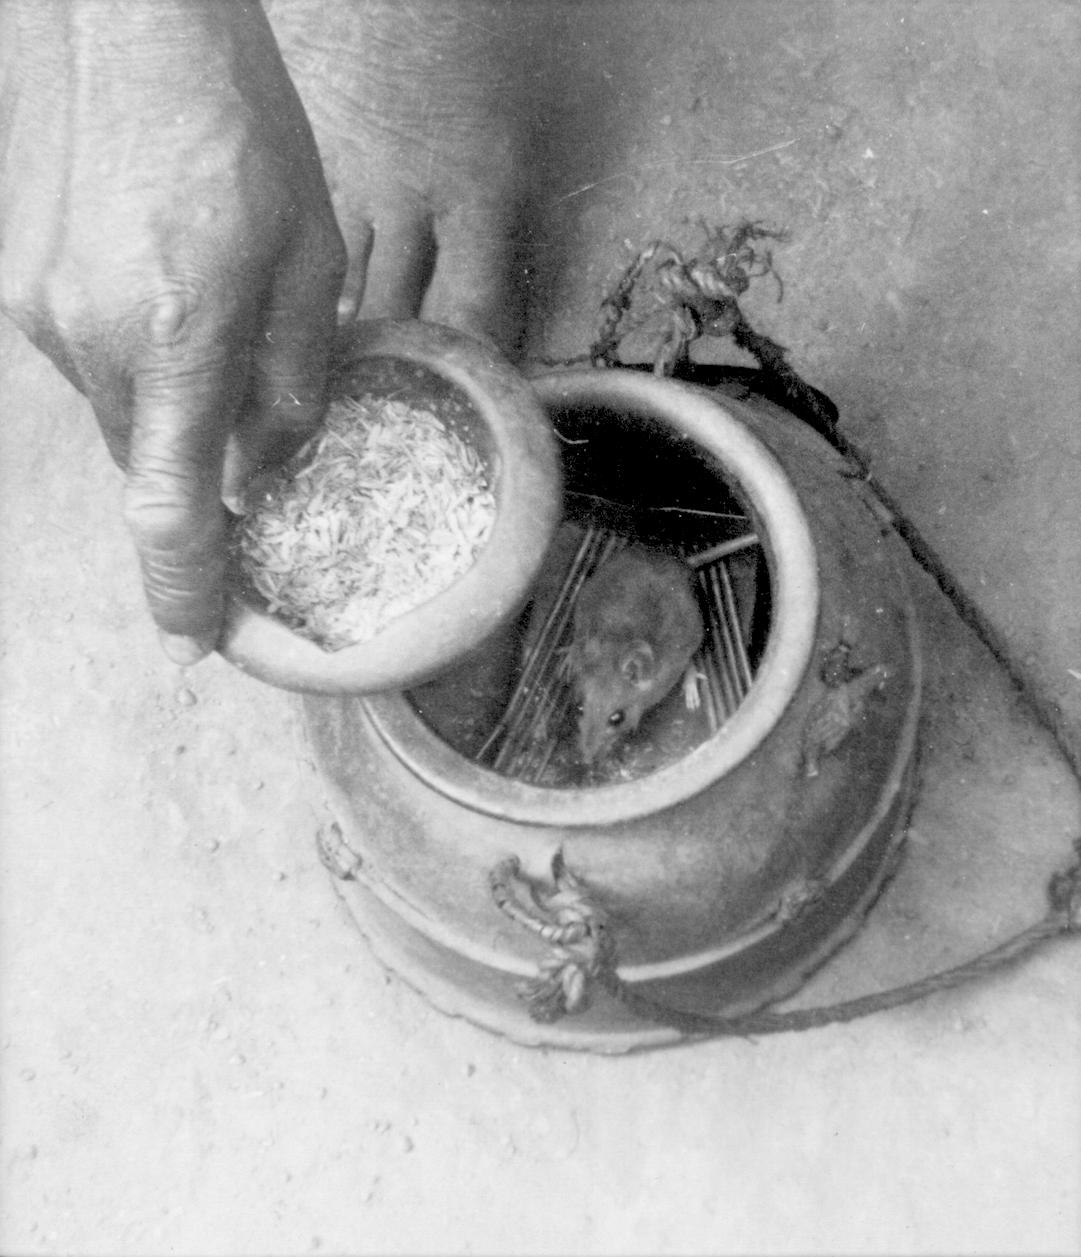 Baule mouse oracle. Photographed by Martin Lippmann (who accompanied Hans Himmelheber), 1935. Image courtesy of: Frobenius Institute, Frankfurt am Main, Germany (#EBA-B 02563).